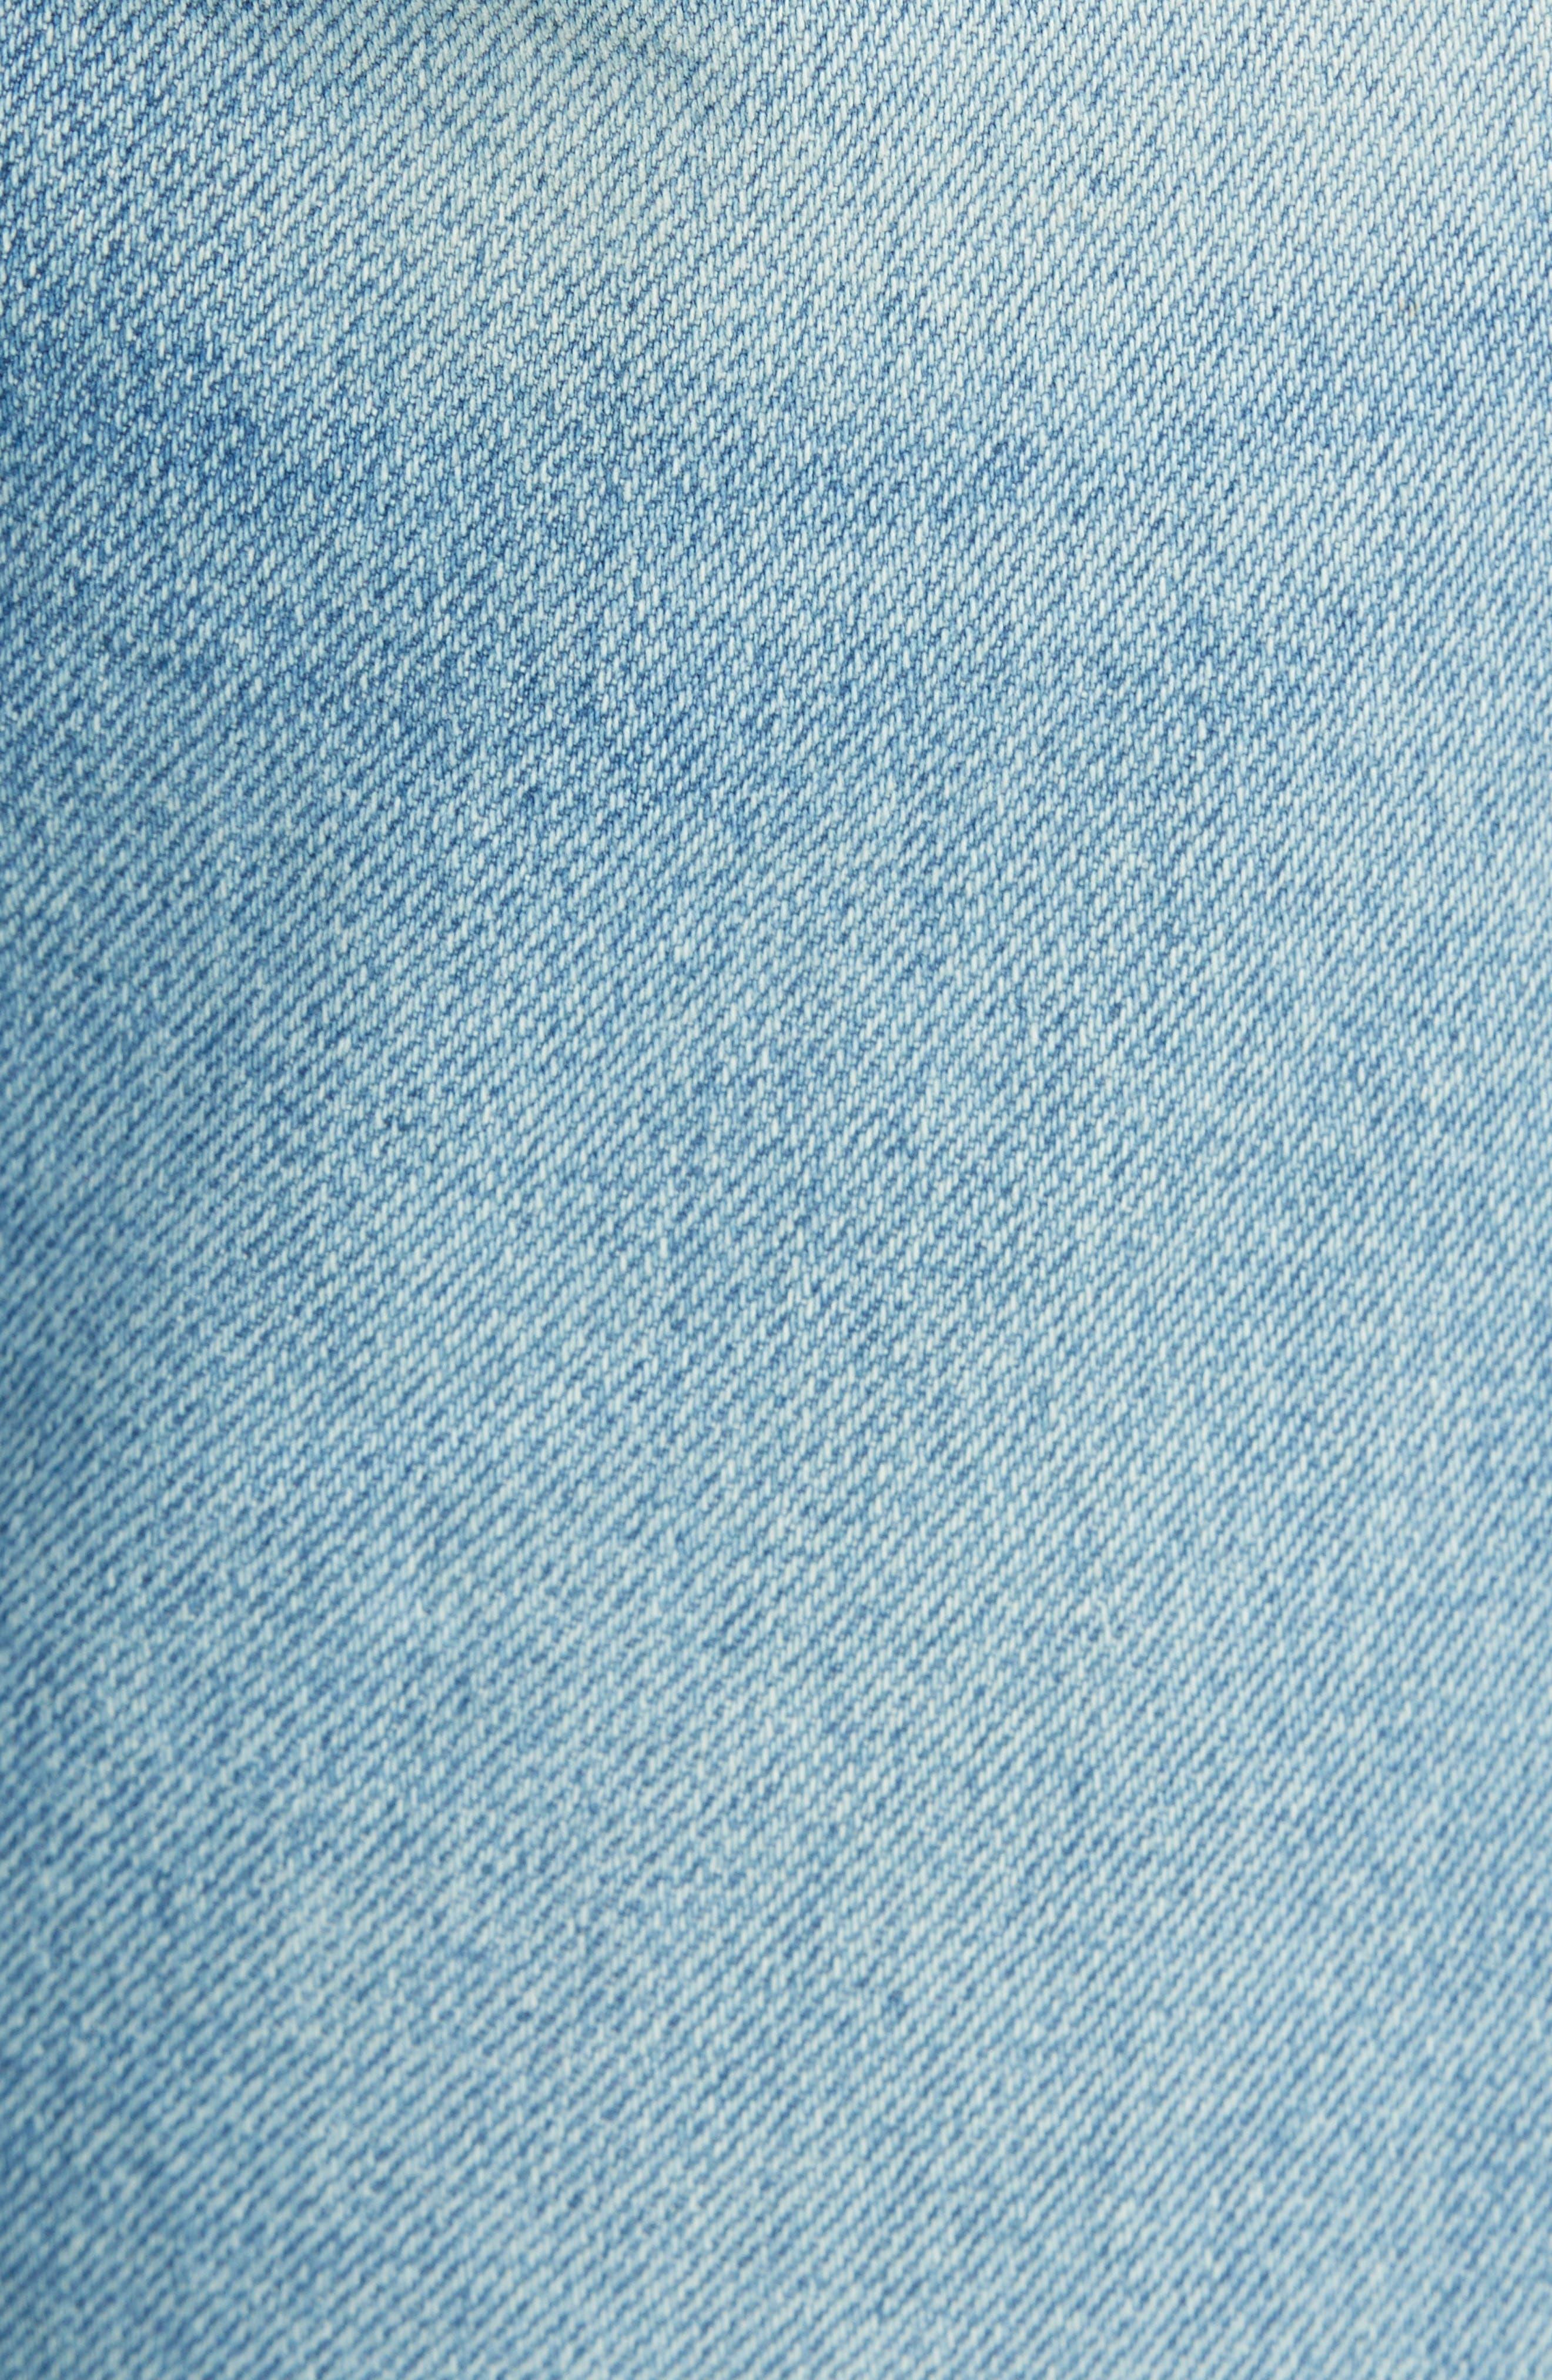 Fit 1 Skinny Fit Jeans,                             Alternate thumbnail 5, color,                             JAMIE